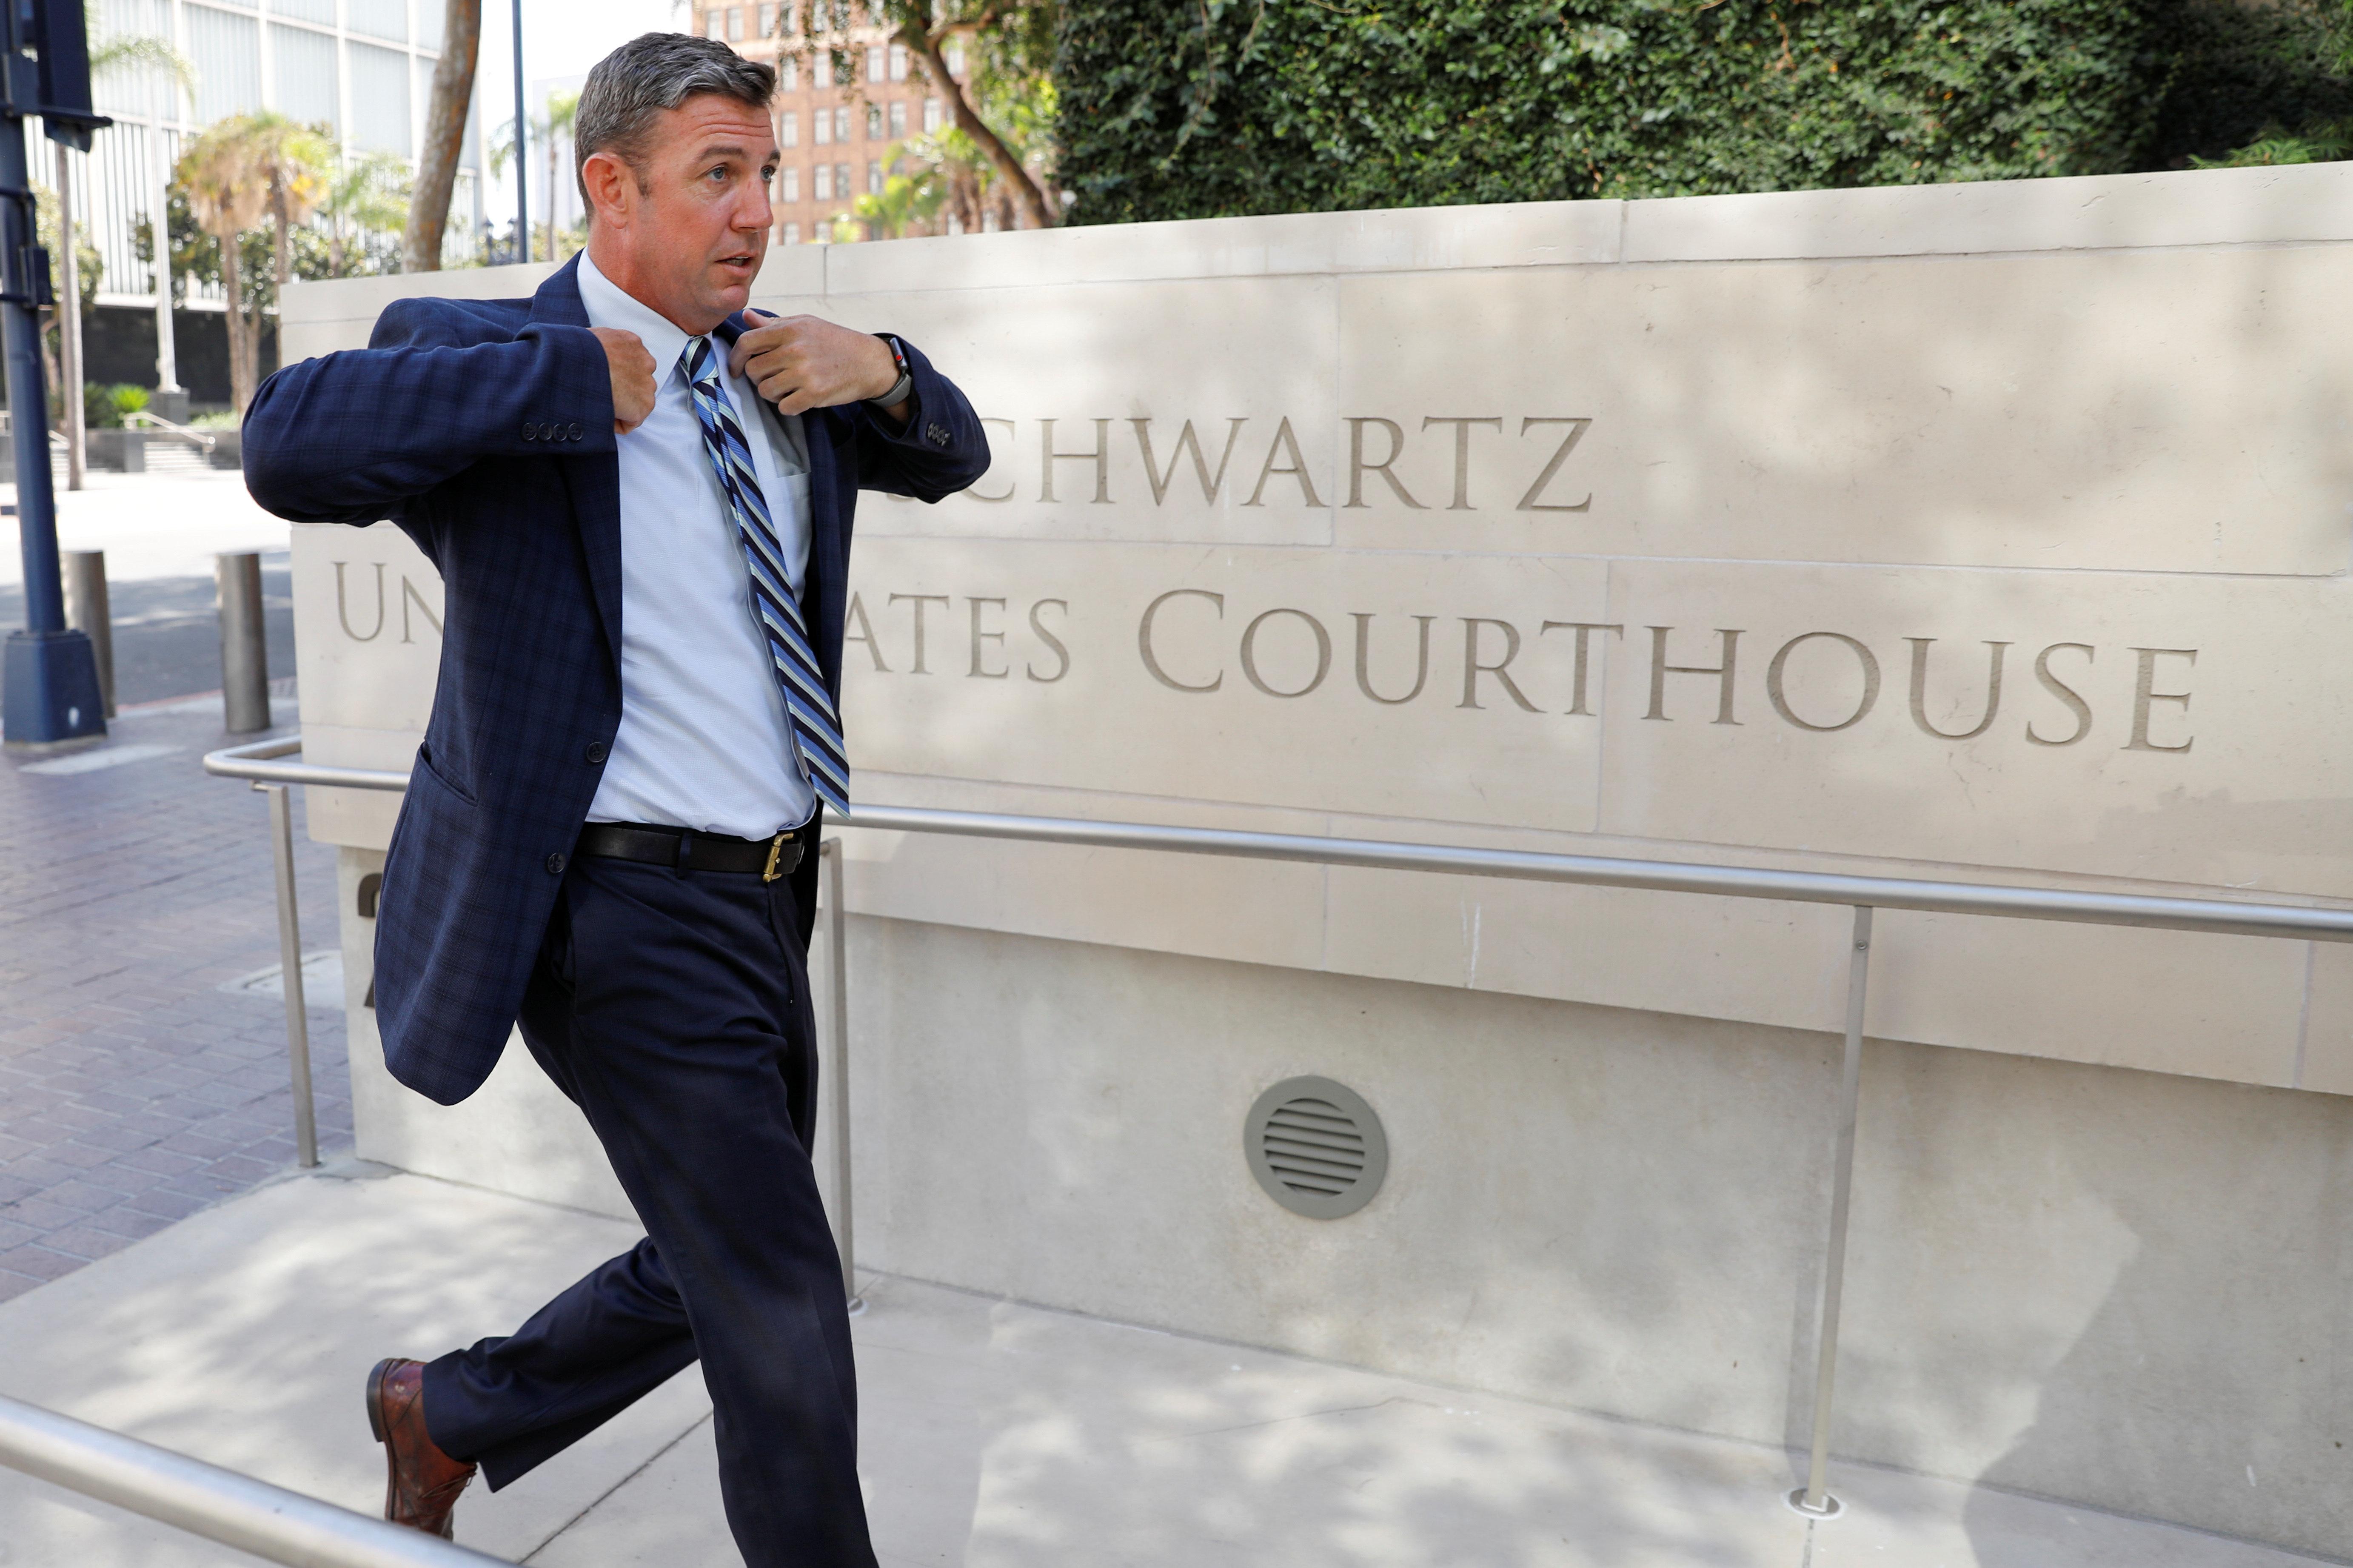 Congressman Duncan Hunter (R-CA) arrives for his arraignment at federal court in San Diego, California, U.S. August 23, 2018.        REUTERS/Mike Blake